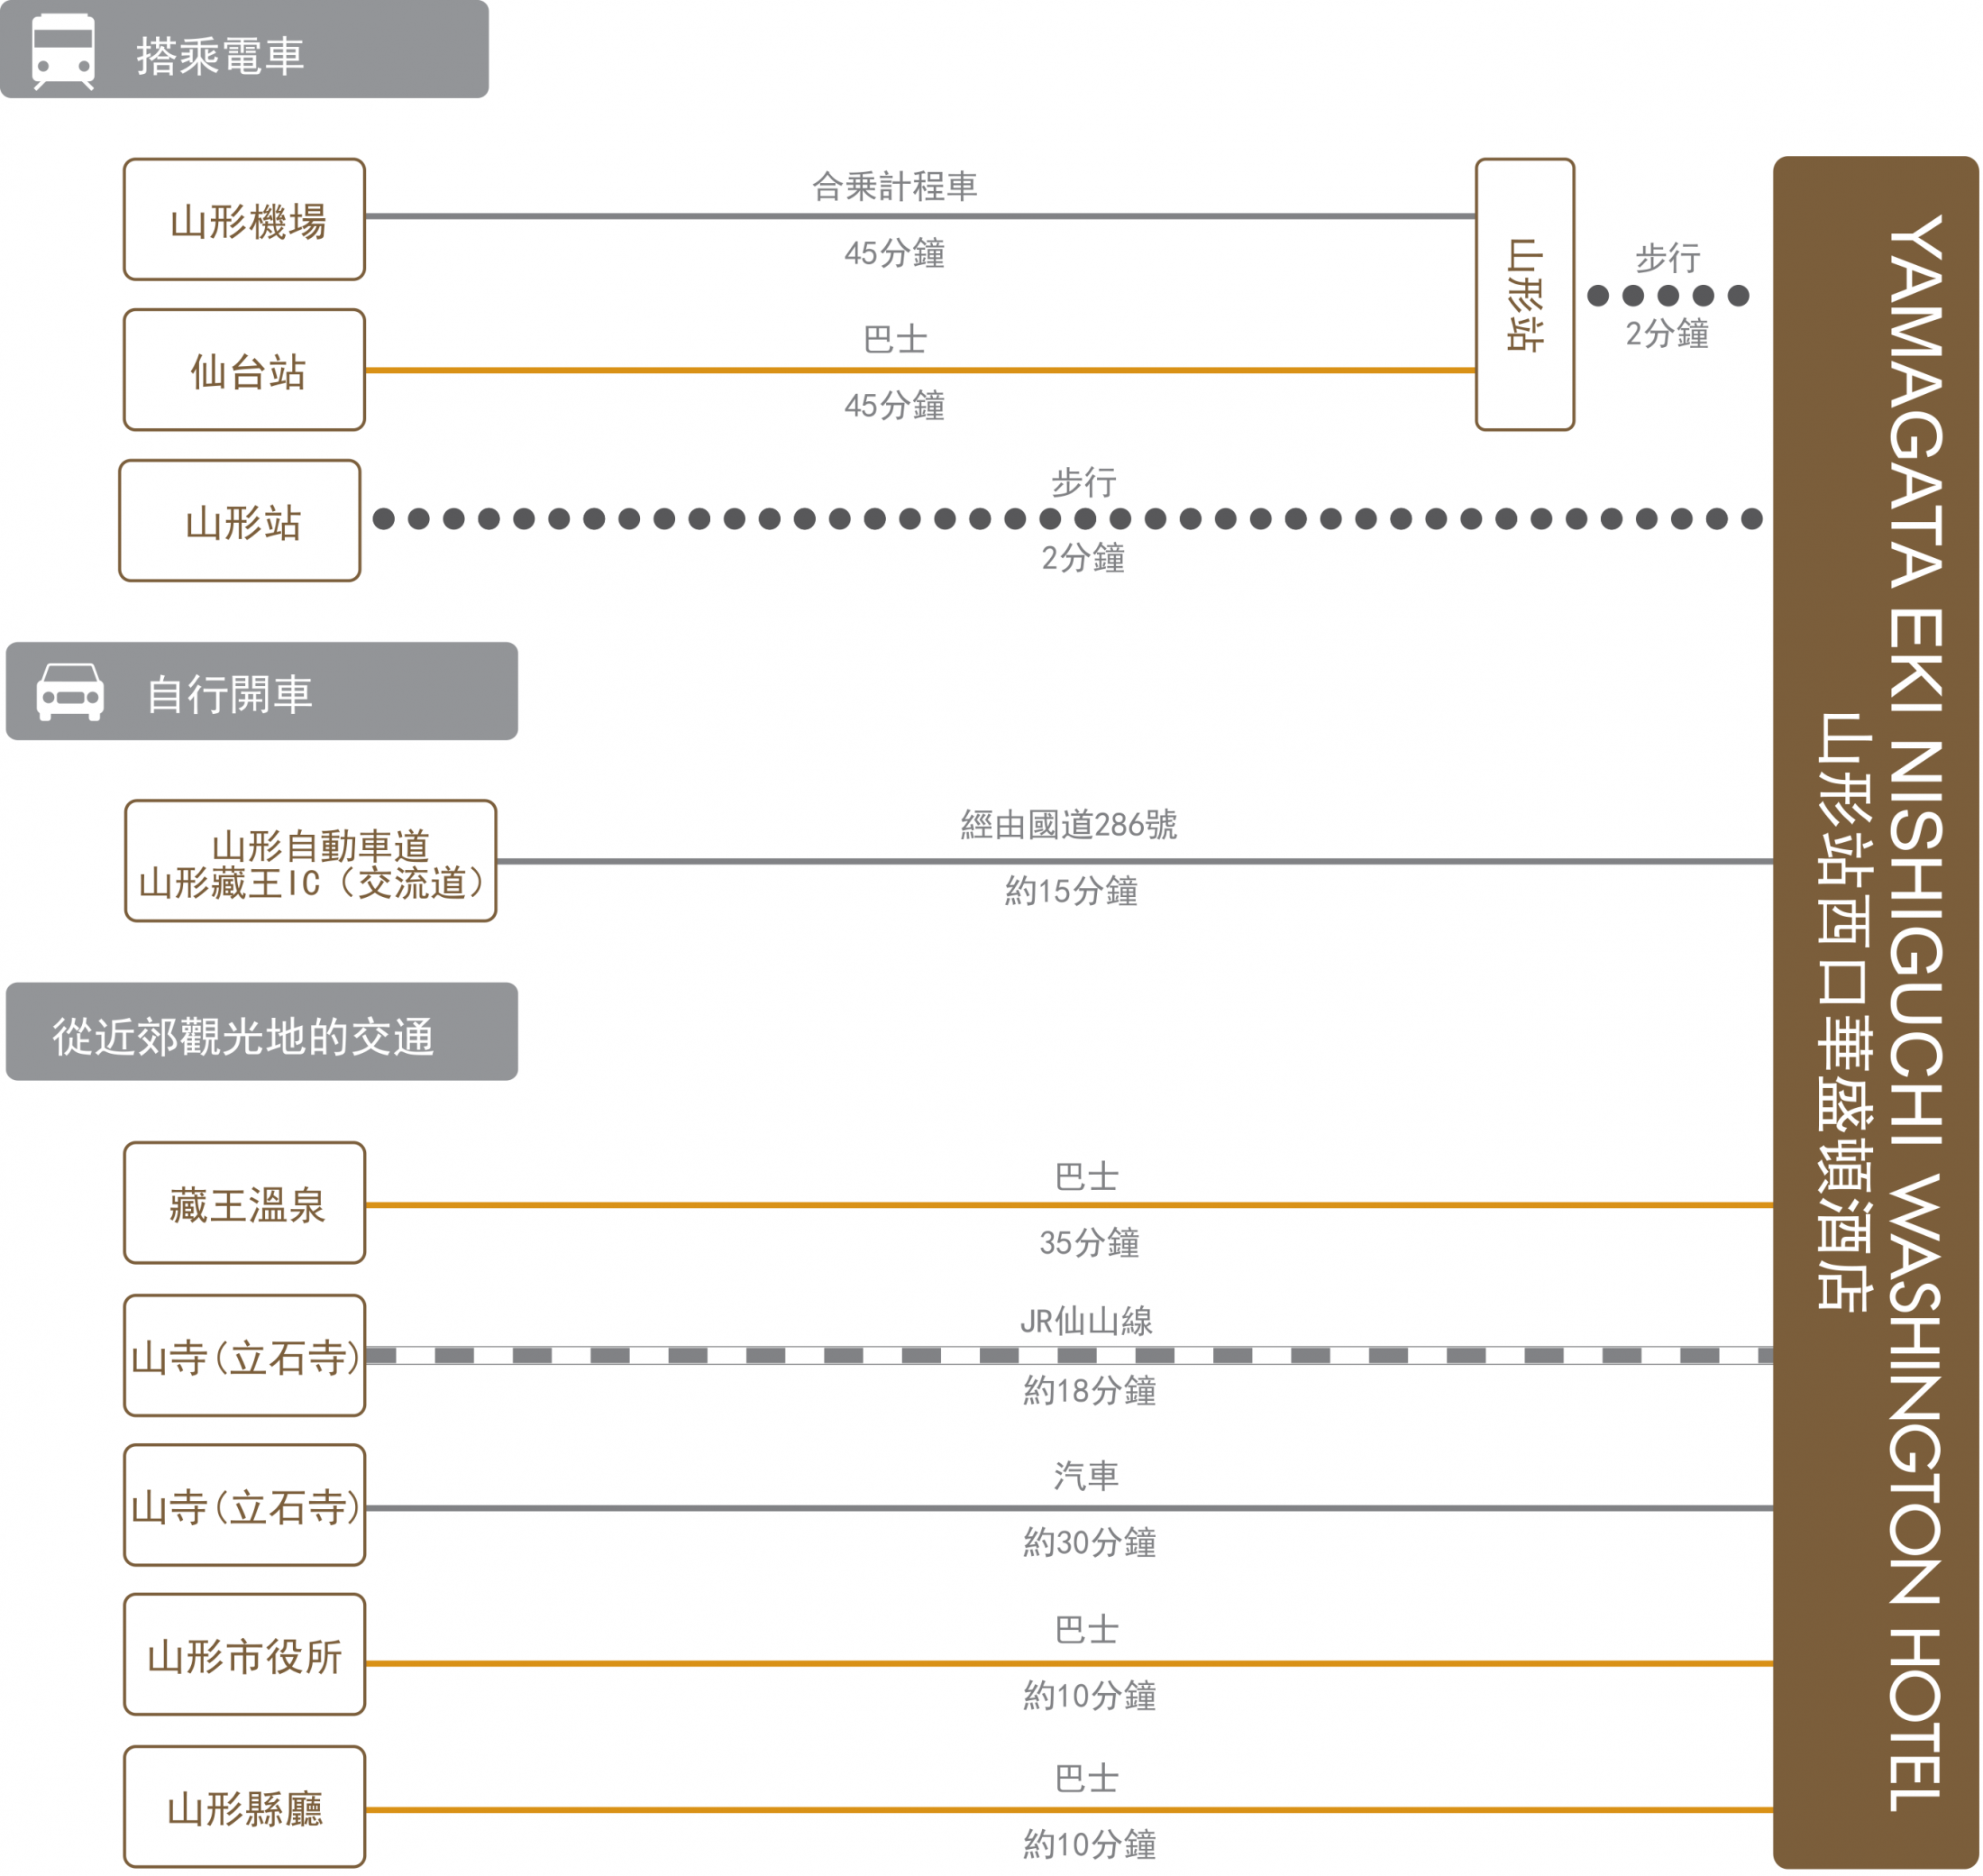 chart_zh-tw_yamagata-nishiguchi_wh